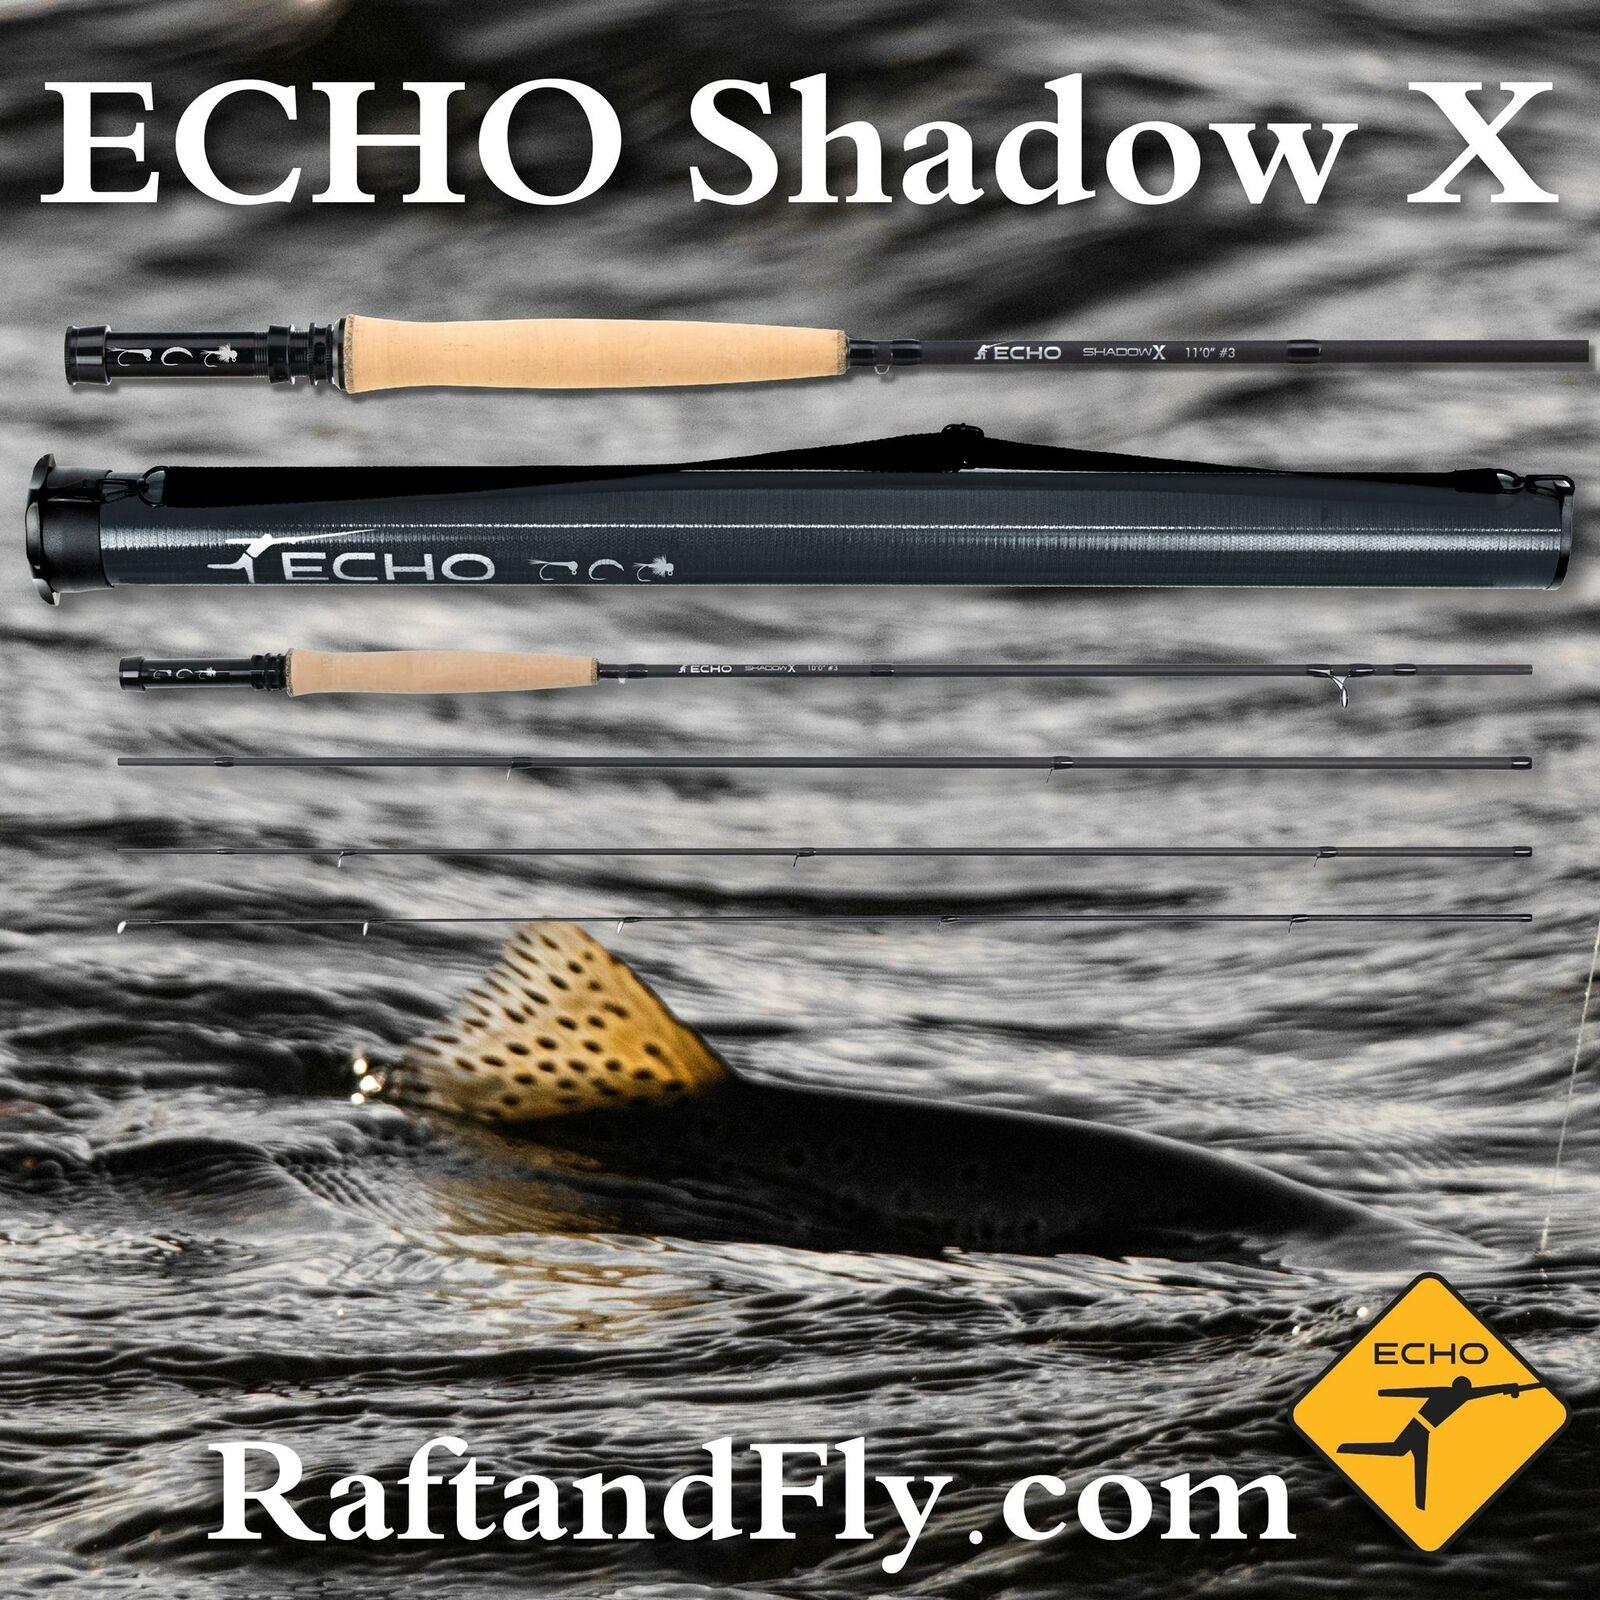 ECHO Shadow X 3wt 10'6  Lifetime Warranty  Free Shipping